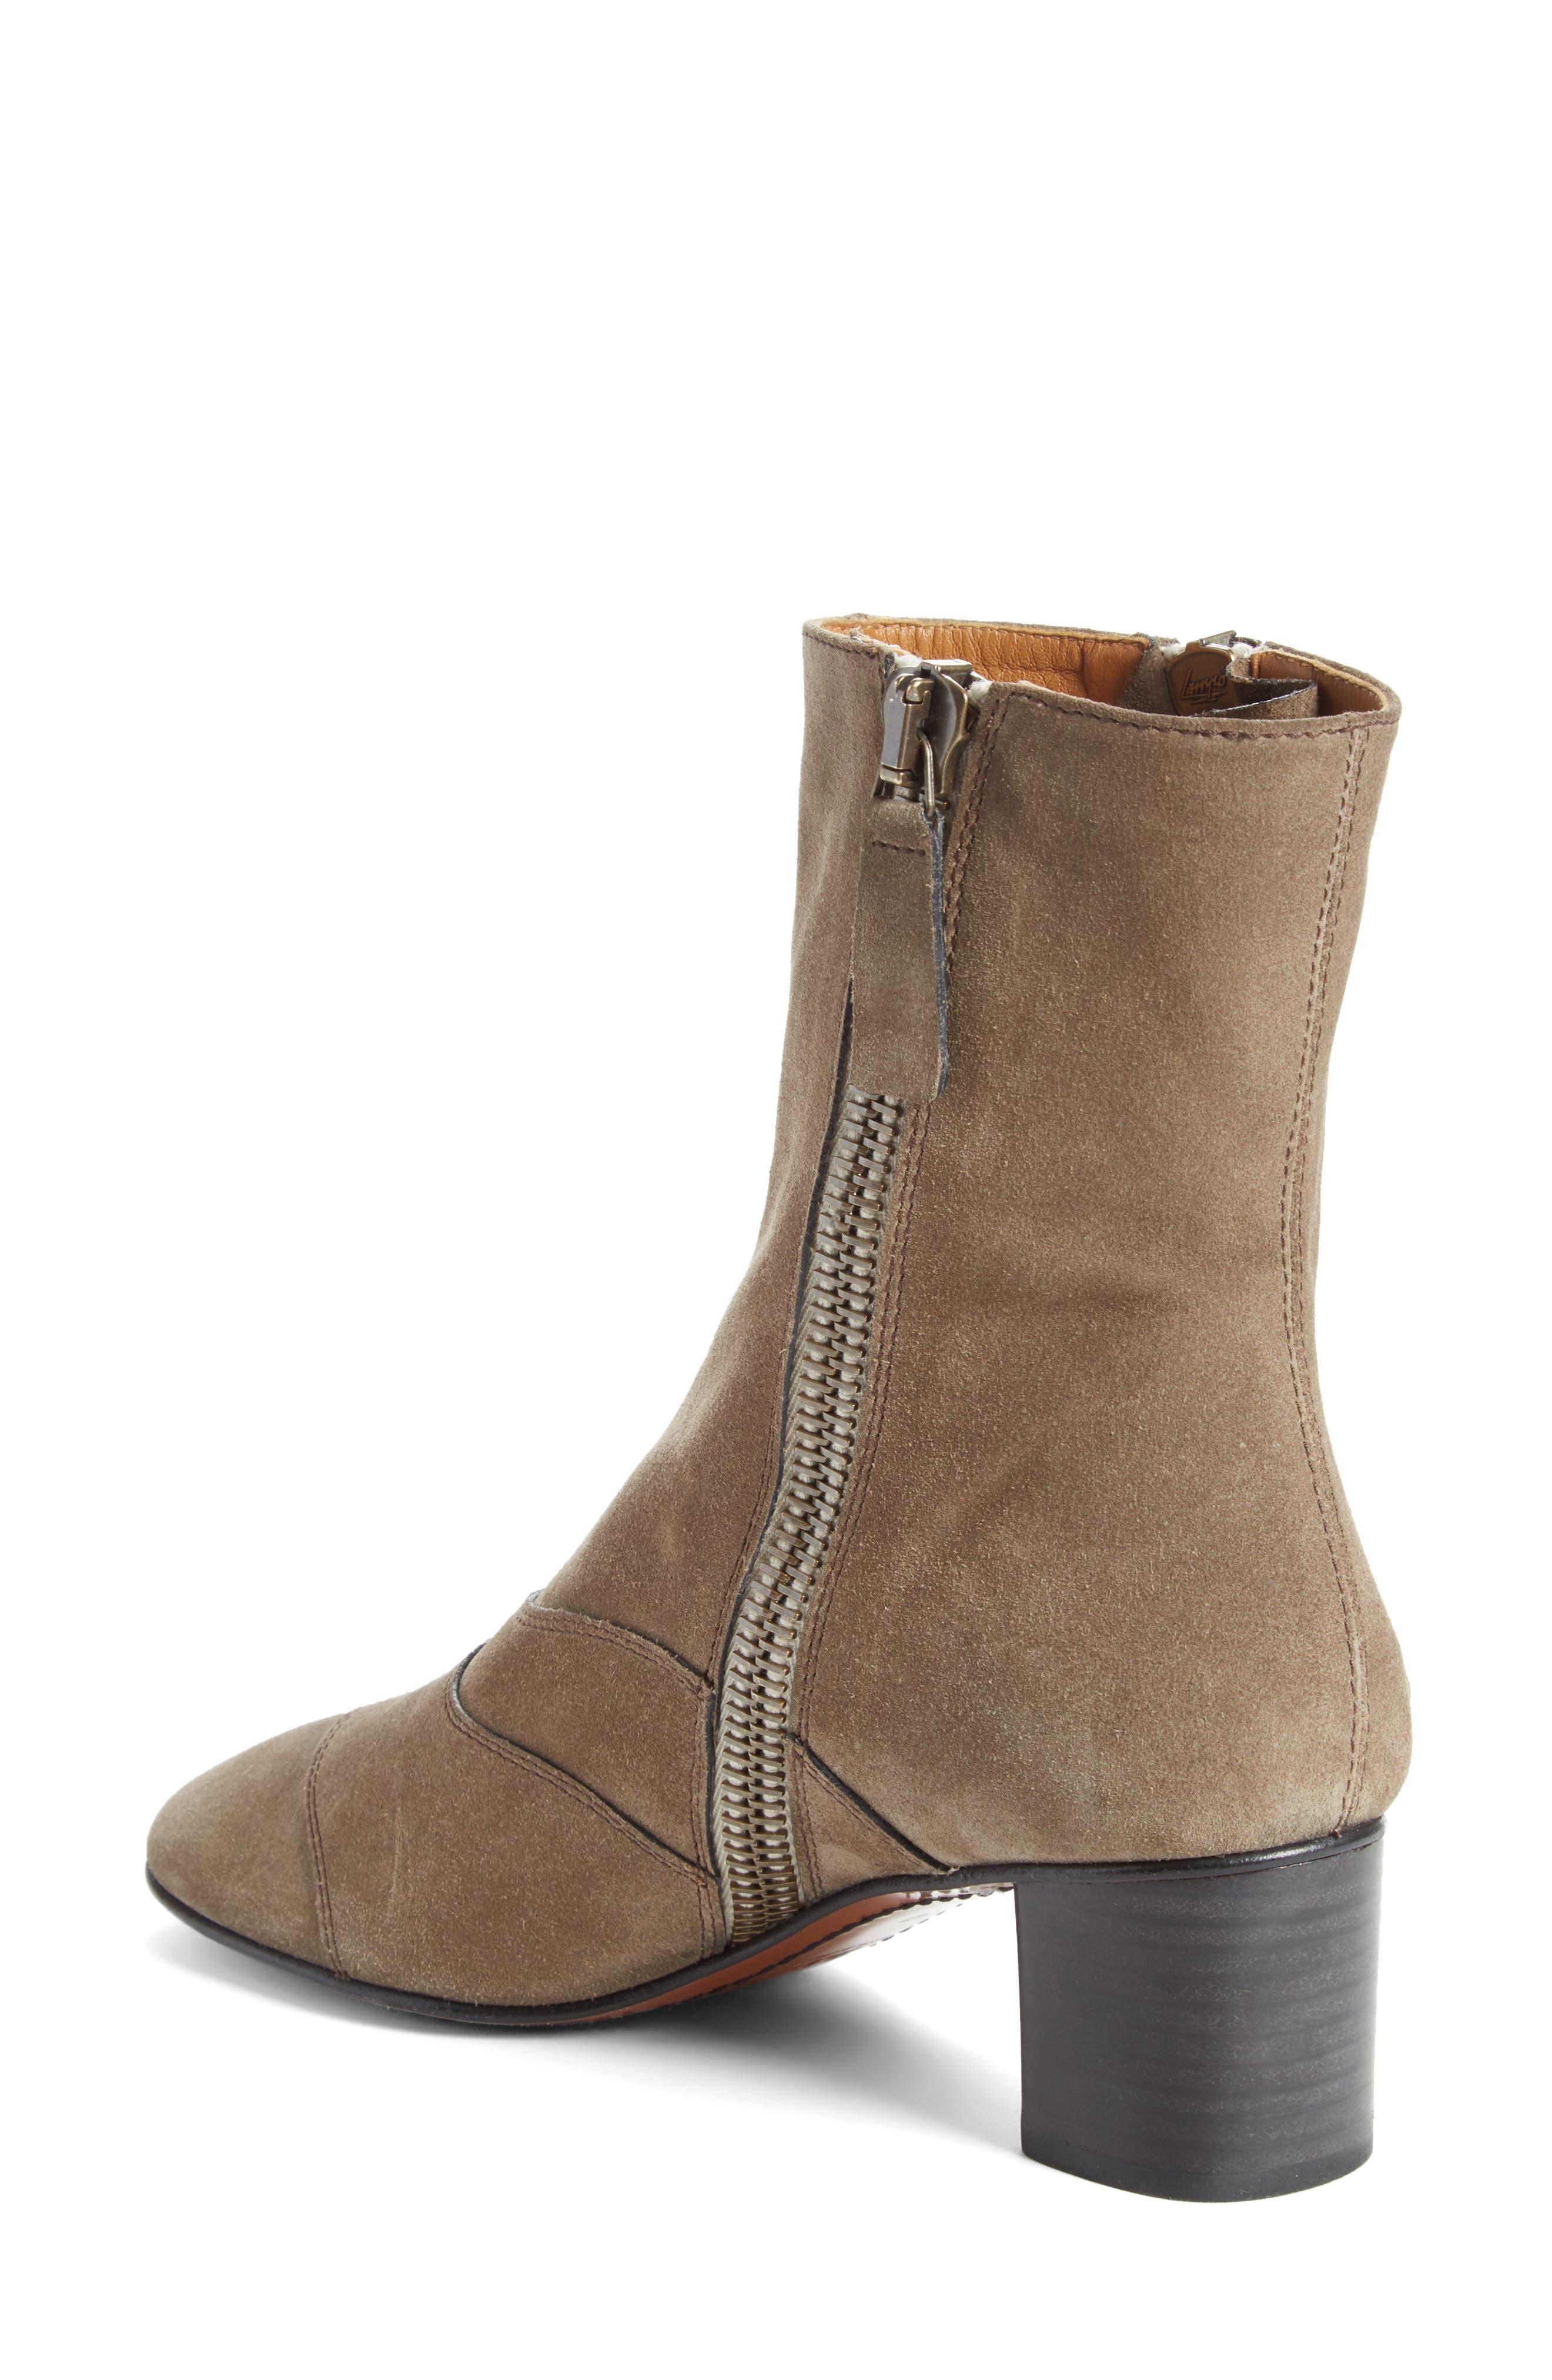 Lexie Block Heel Boot,                             Alternate thumbnail 2, color,                             Dark Greige